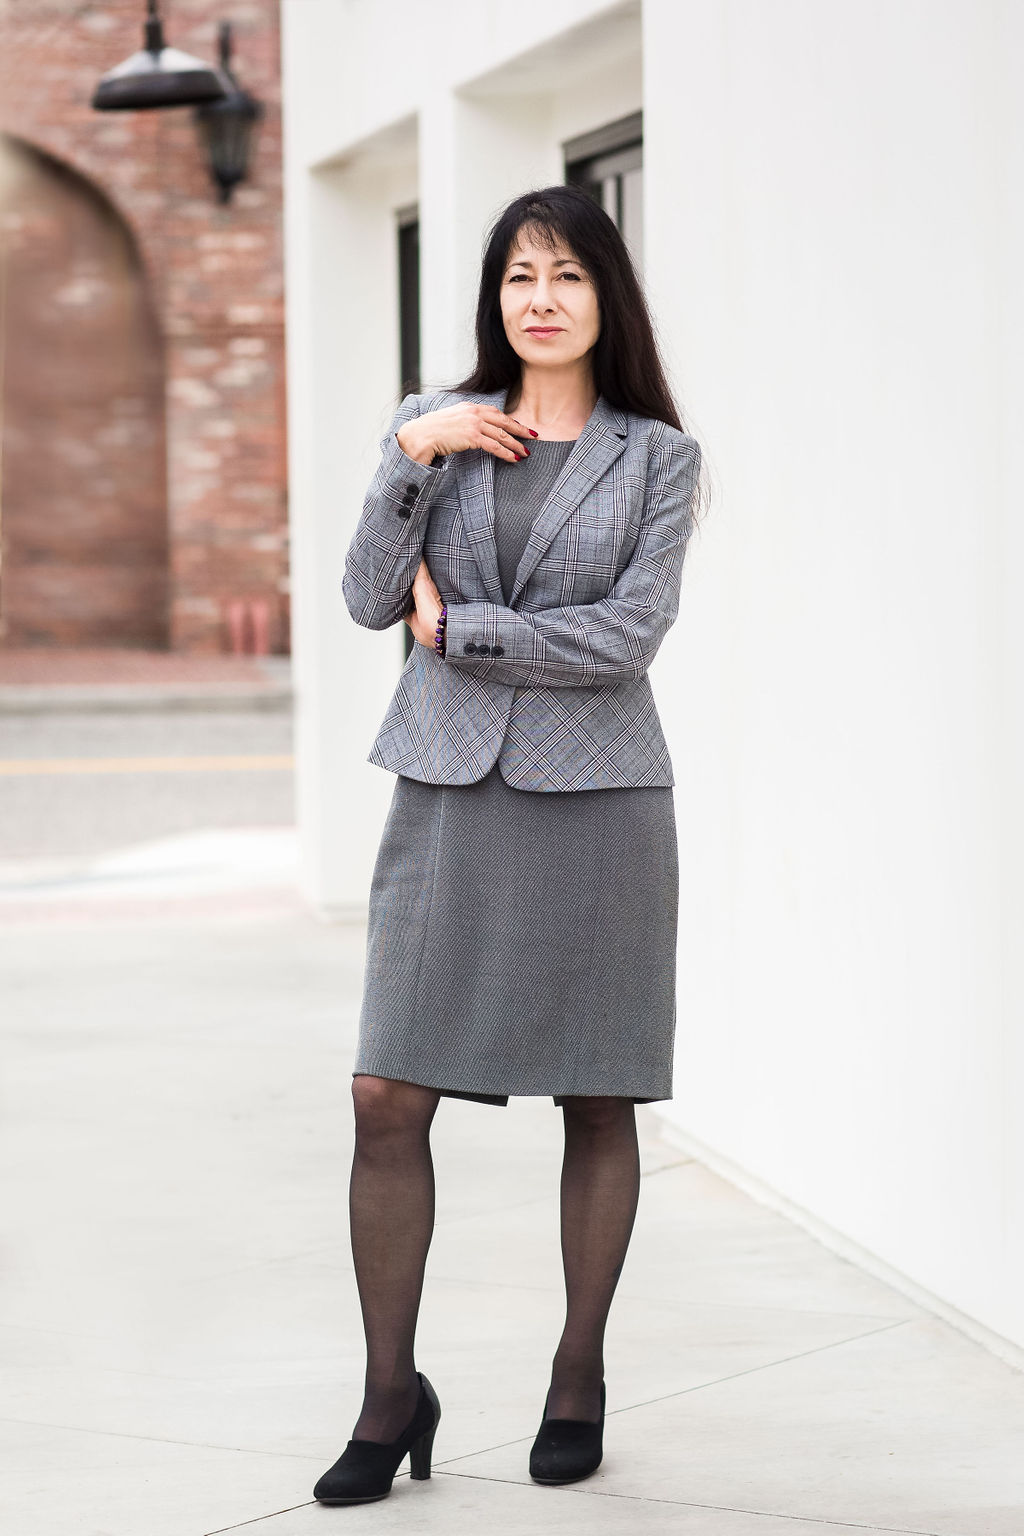 Michiko Vartanian - Associate Attorney